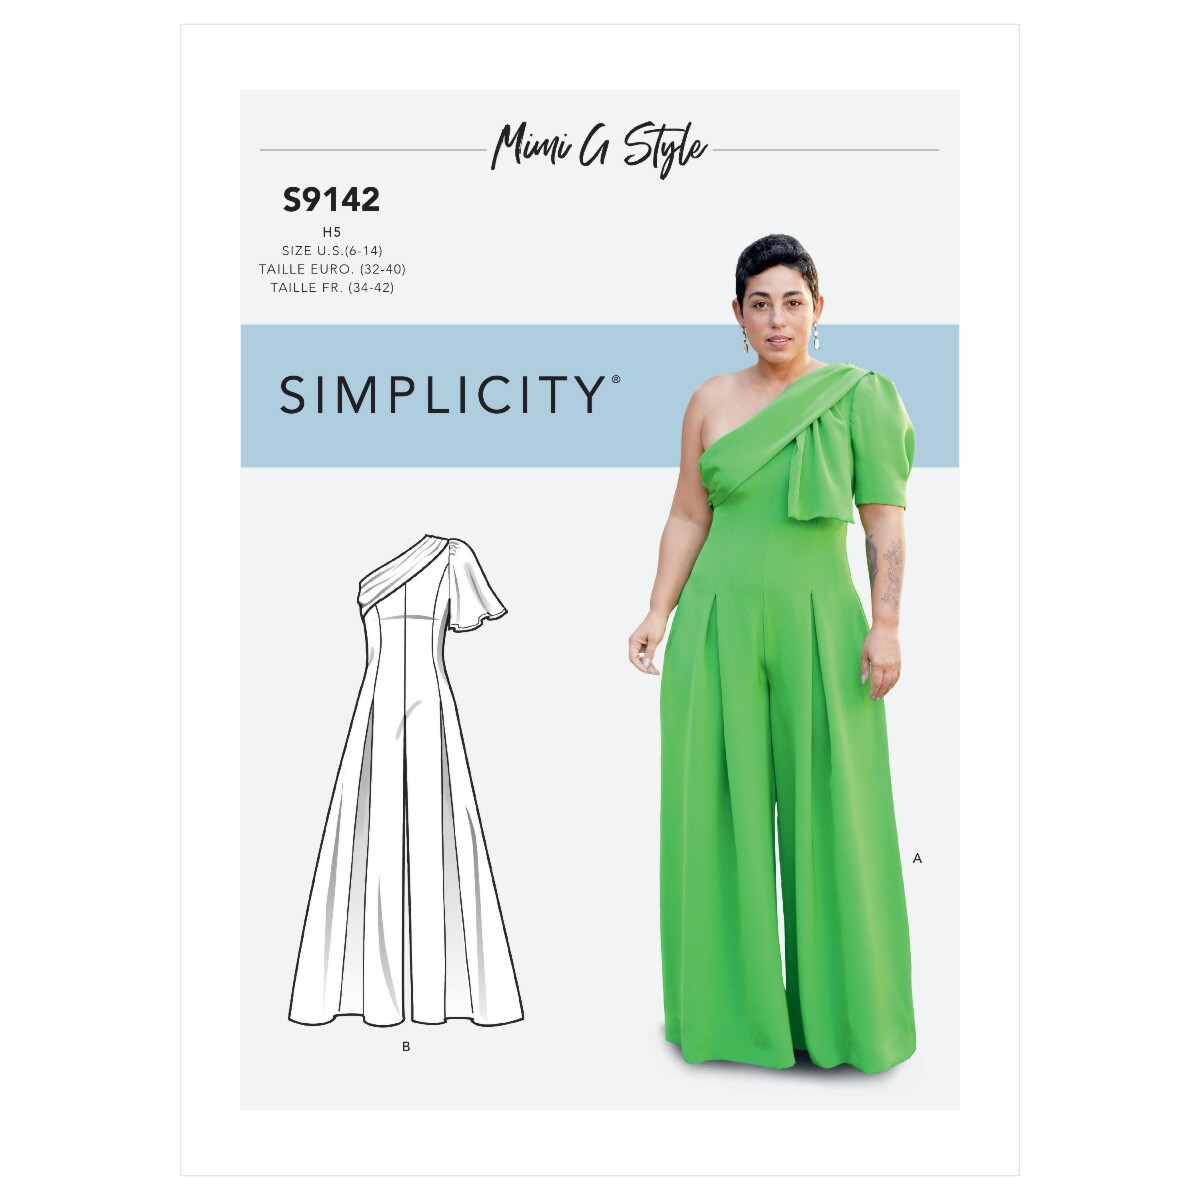 Simplicity - 9142